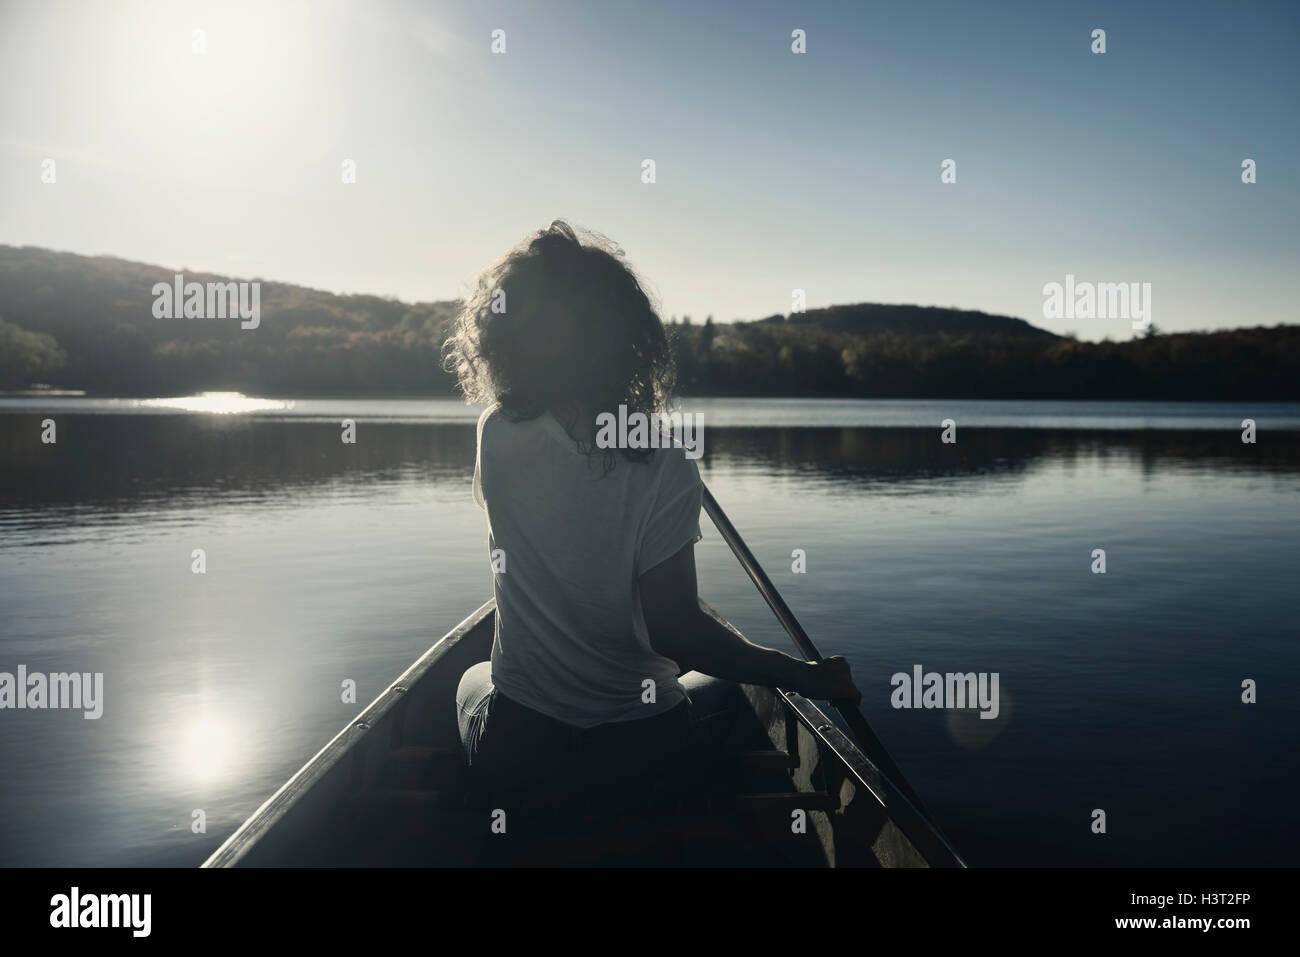 Mujer joven canoa en un lago en otoño. Muskoka, Ontario, Canadá. Imagen De Stock